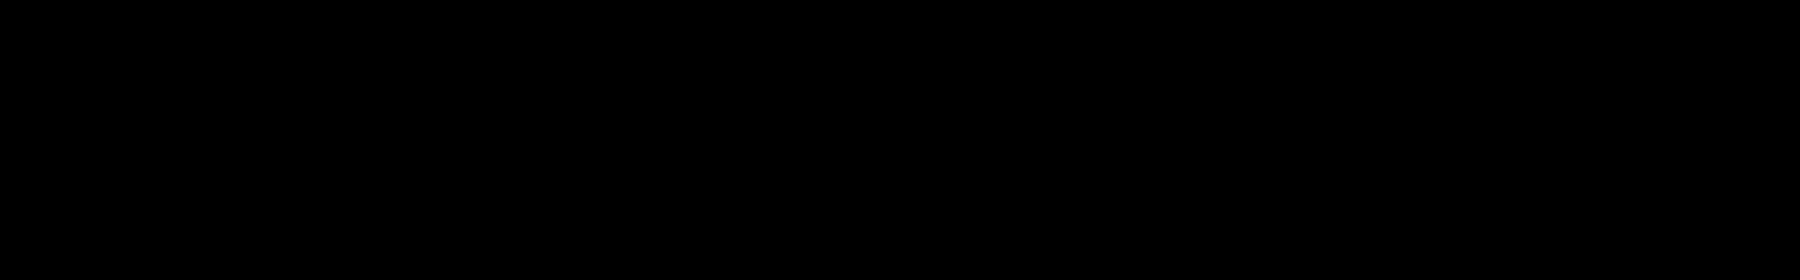 Vorm - Techno audio waveform